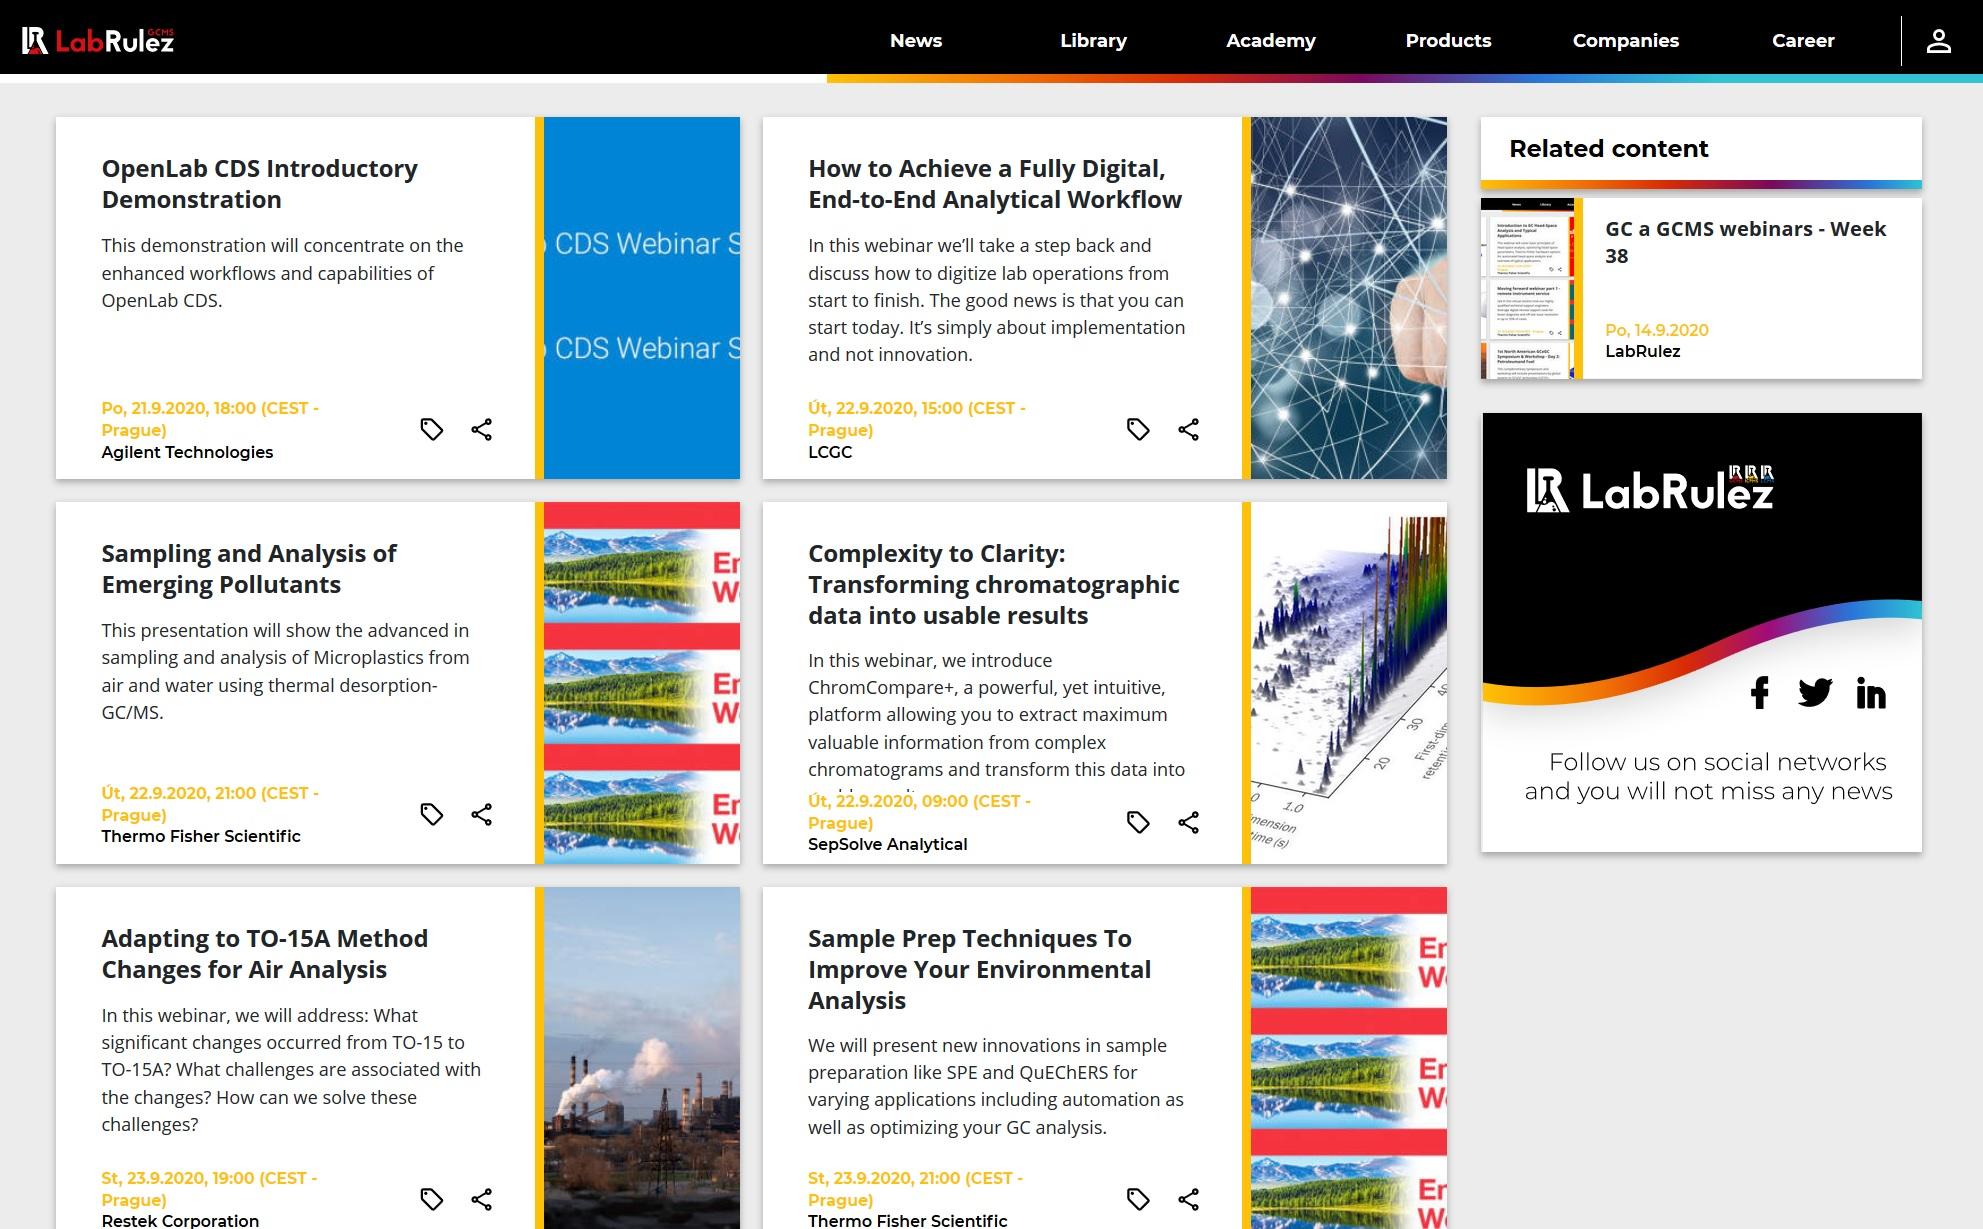 LabRulez: GC a GCMS webinars - Week 39